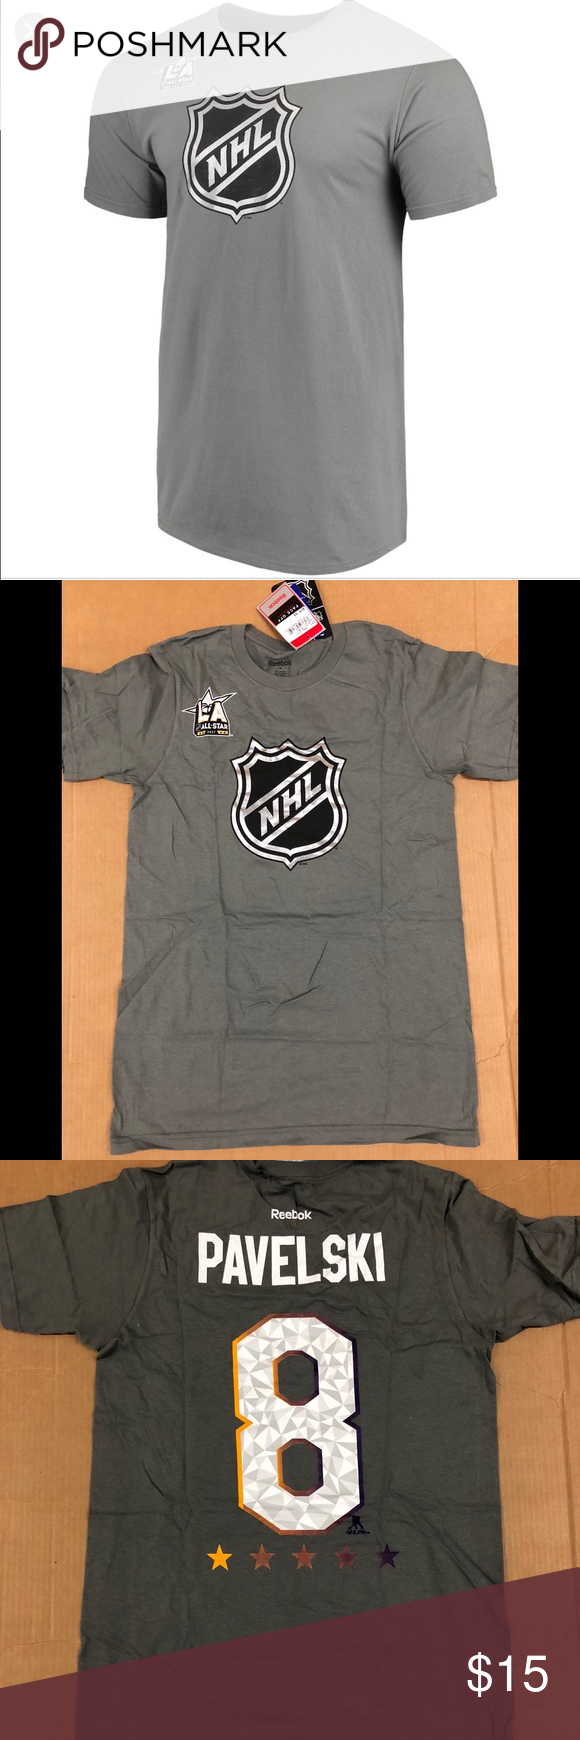 512866fcf51 E Reebok NHL all stars Pavelski gray T-shirt NWT NWT 100% cotton Reebok  Shirts Tees - Short Sleeve